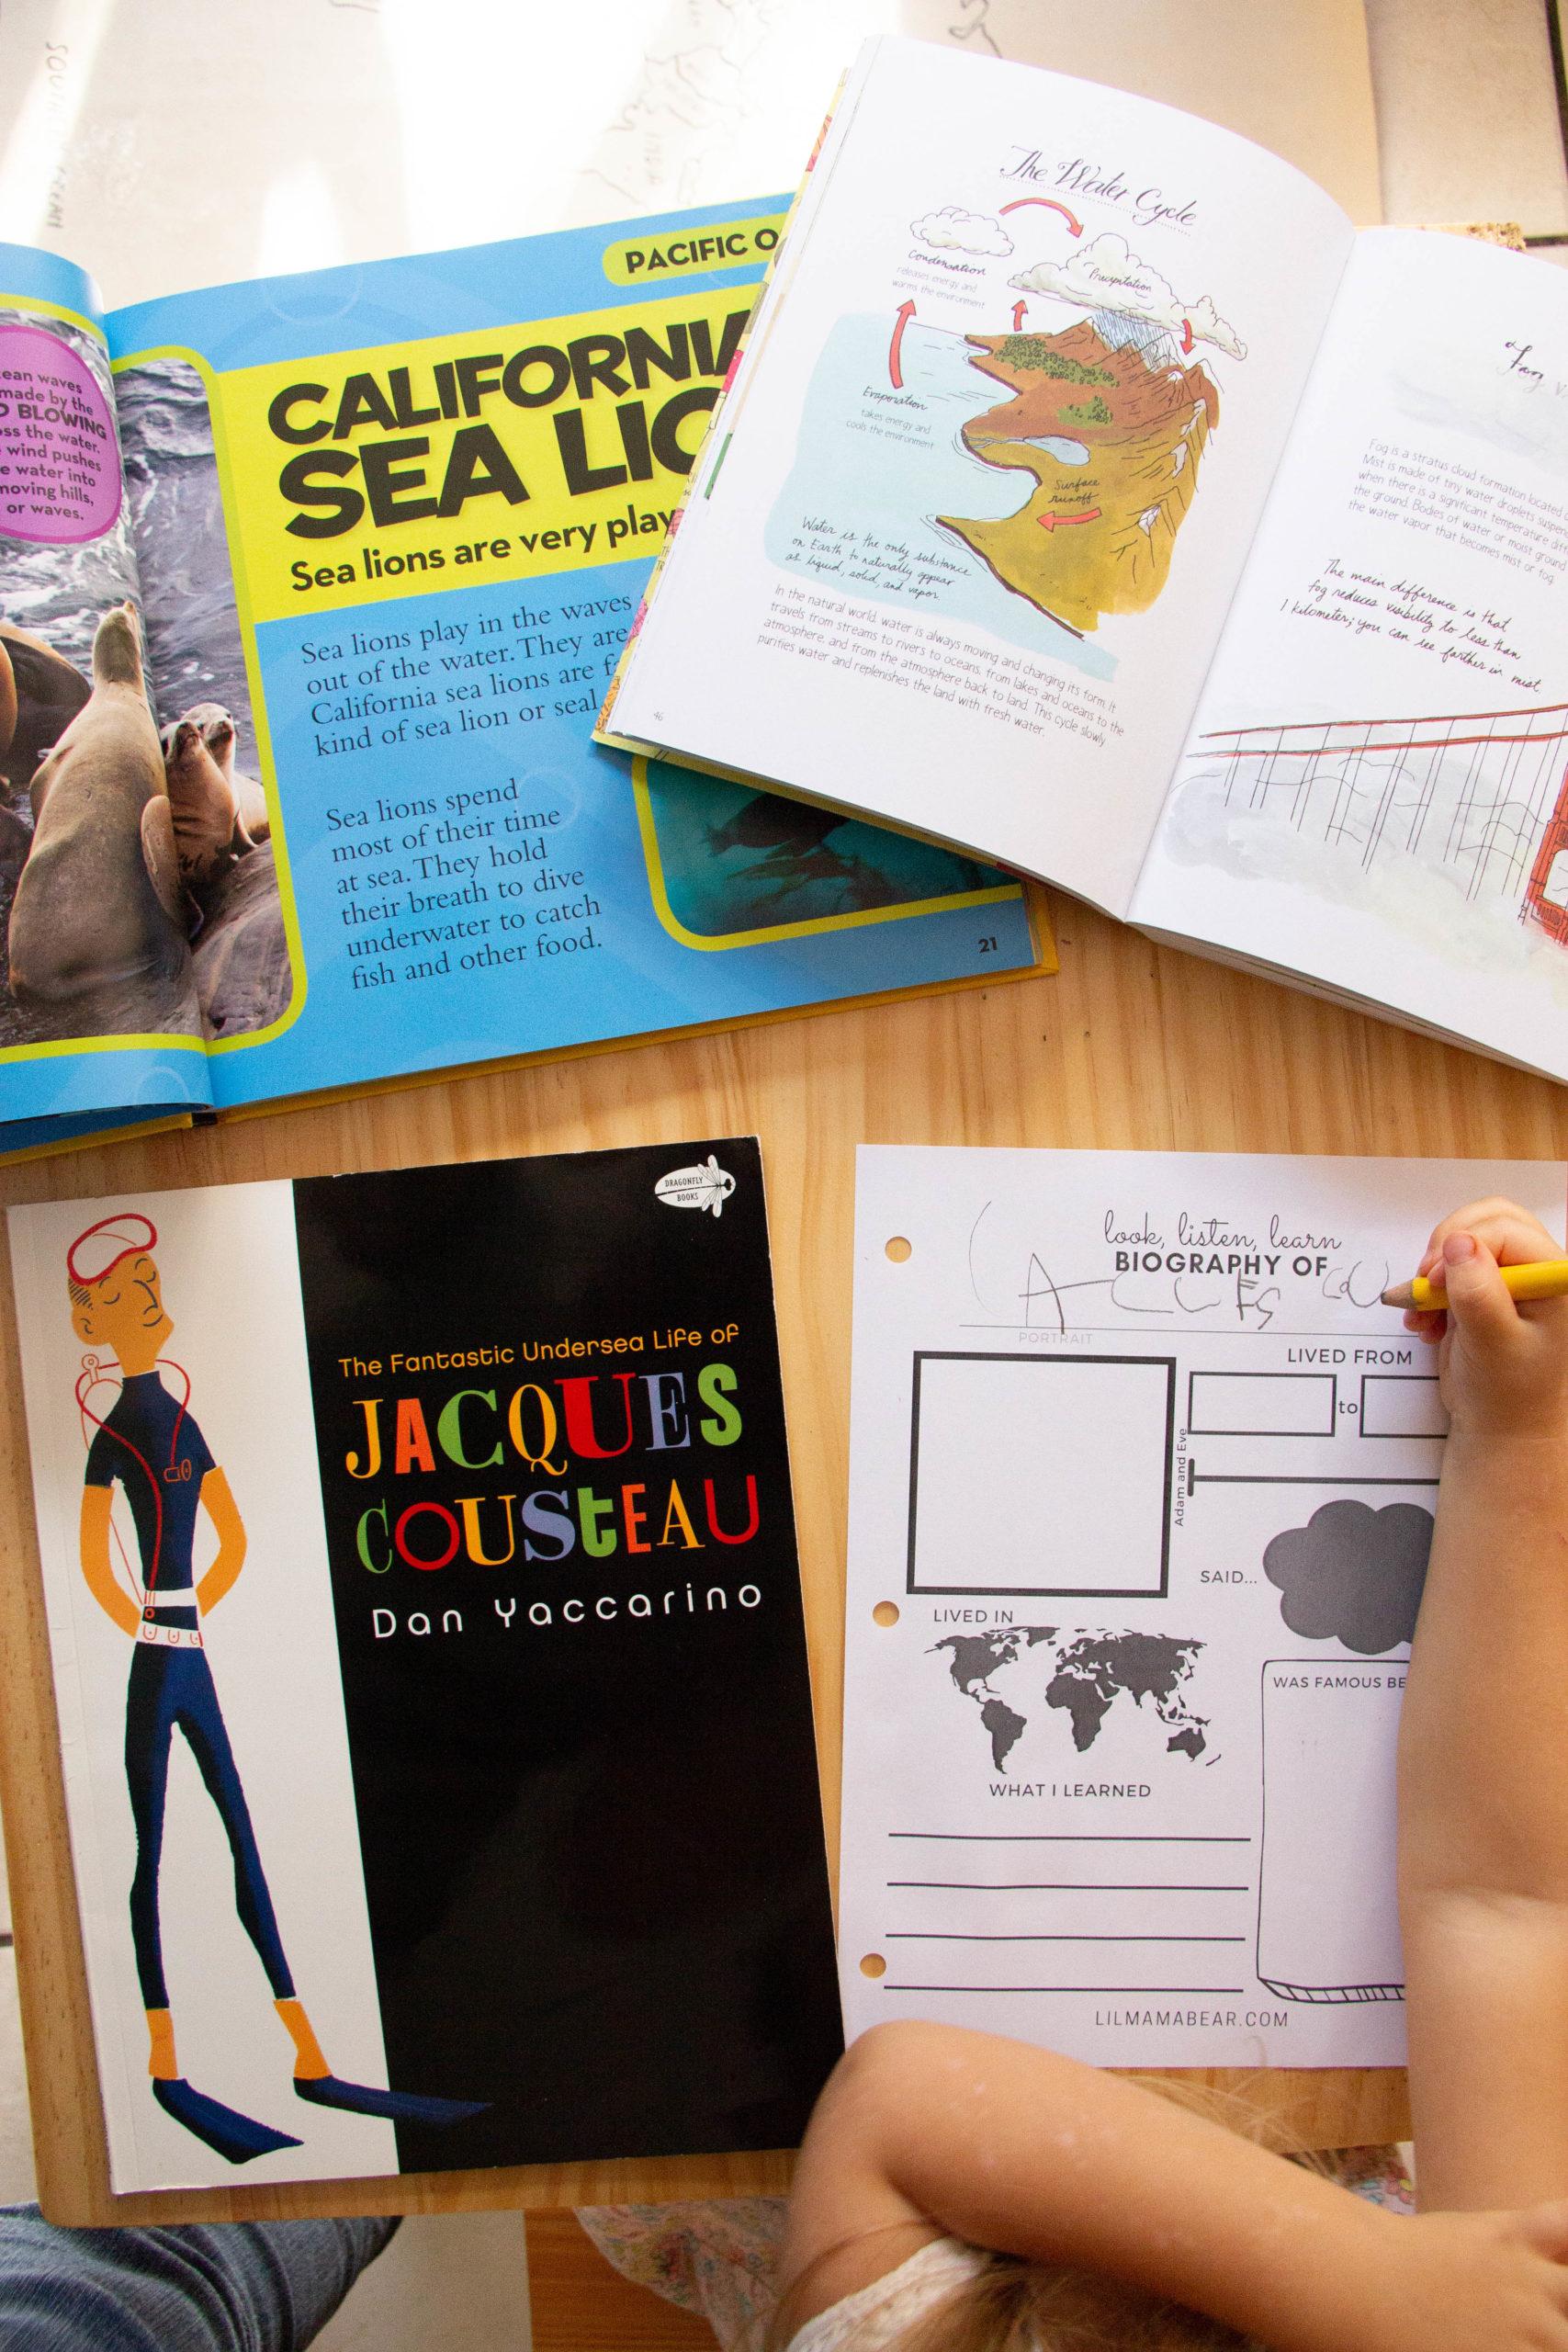 hight resolution of Printable Biography Worksheet: Preschool Social Studies Activity - Lil Mama  Bear Blog